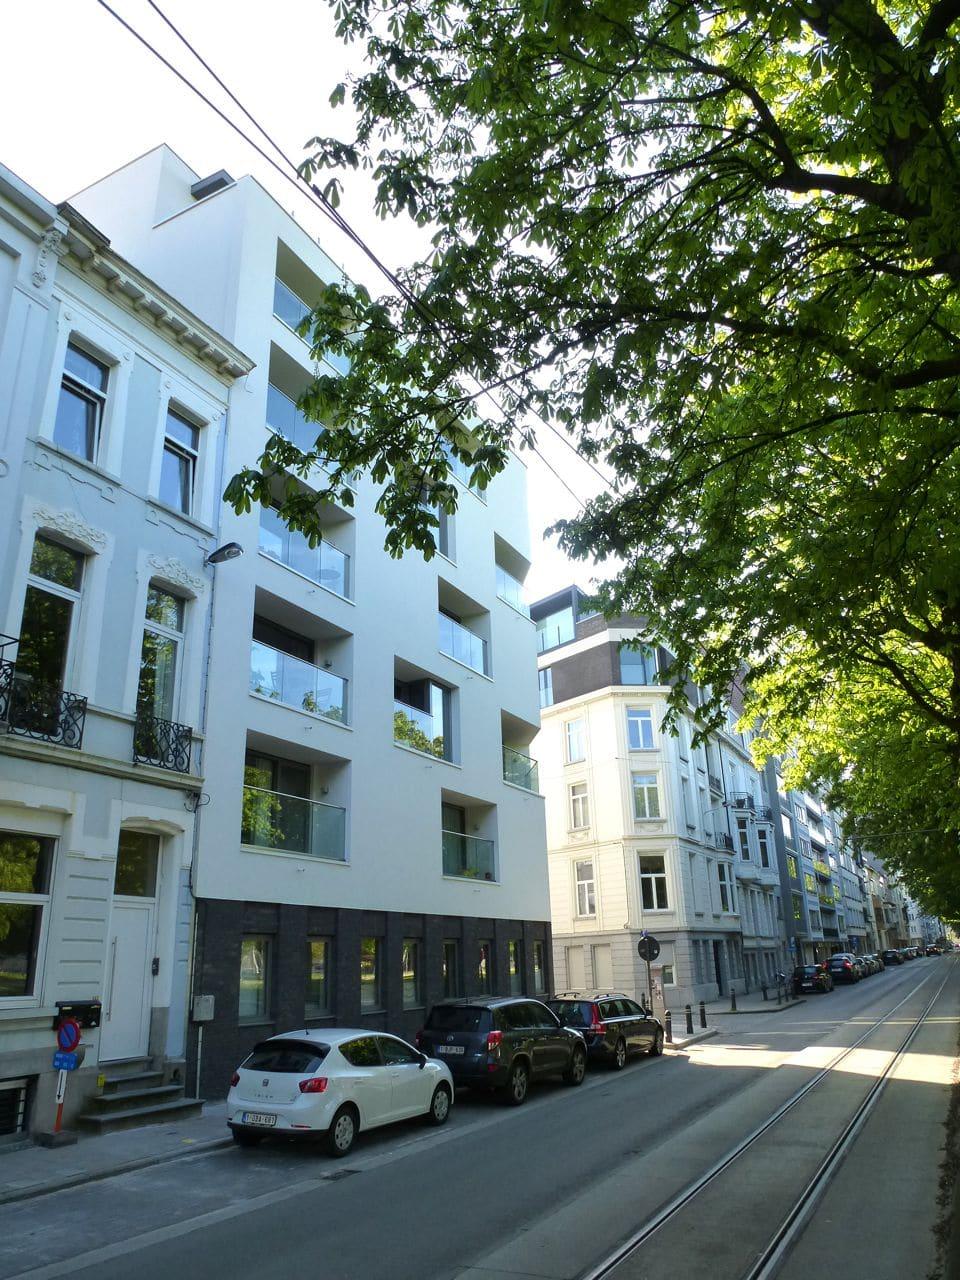 P1120403 | Baeyens & Beck architecten Gent | architect nieuwbouw renovatie interieur | high end | architectenbureau